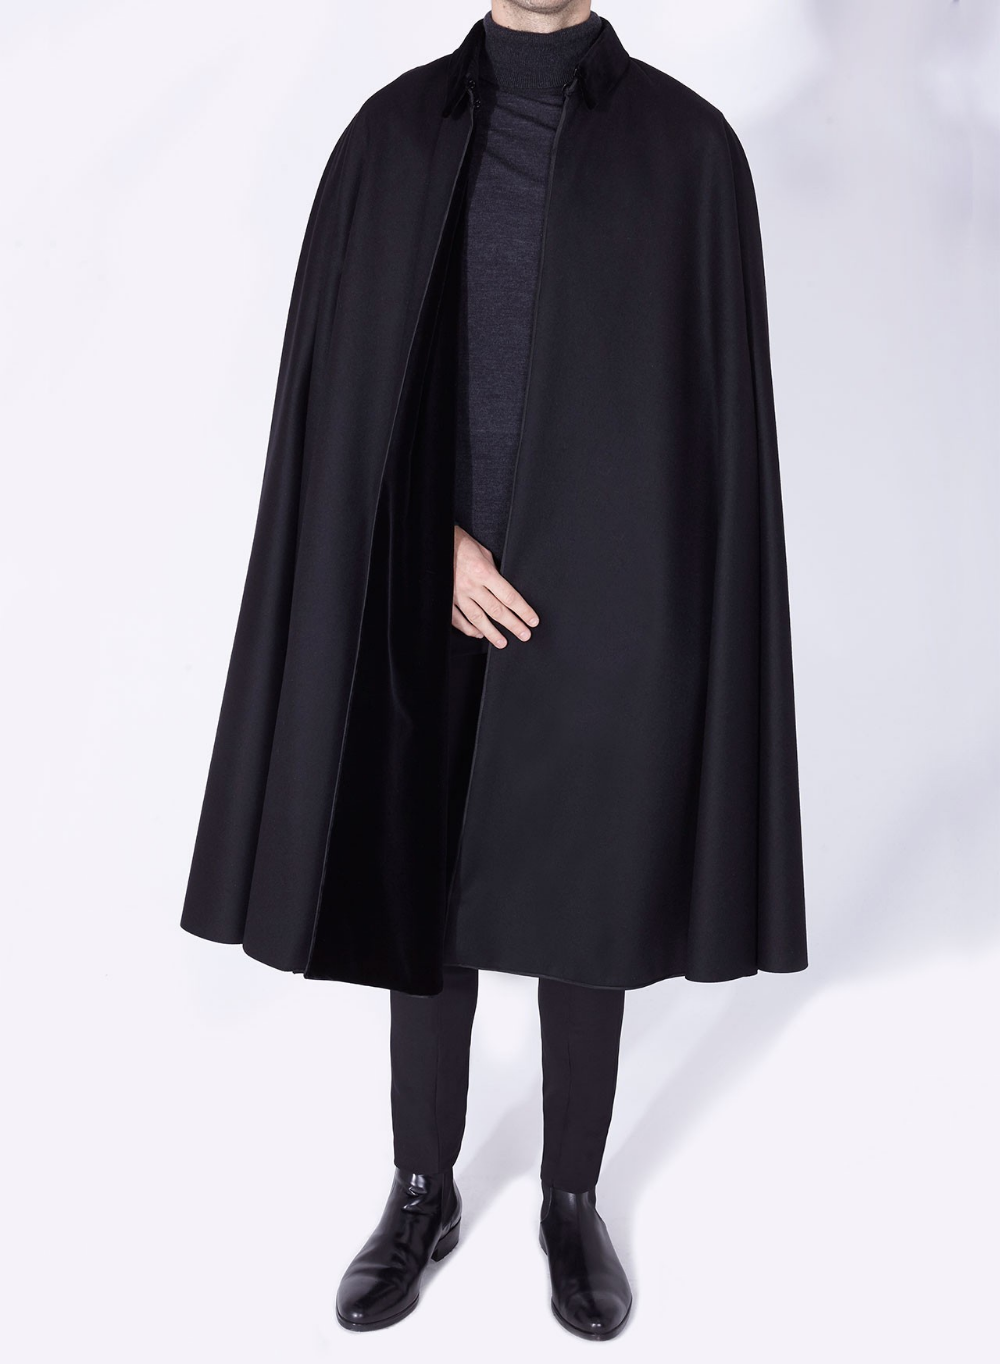 Alfonso Cloak Black Sesena Capes 1901 Cape Fashion Coat Fashion Black Collared Shirt